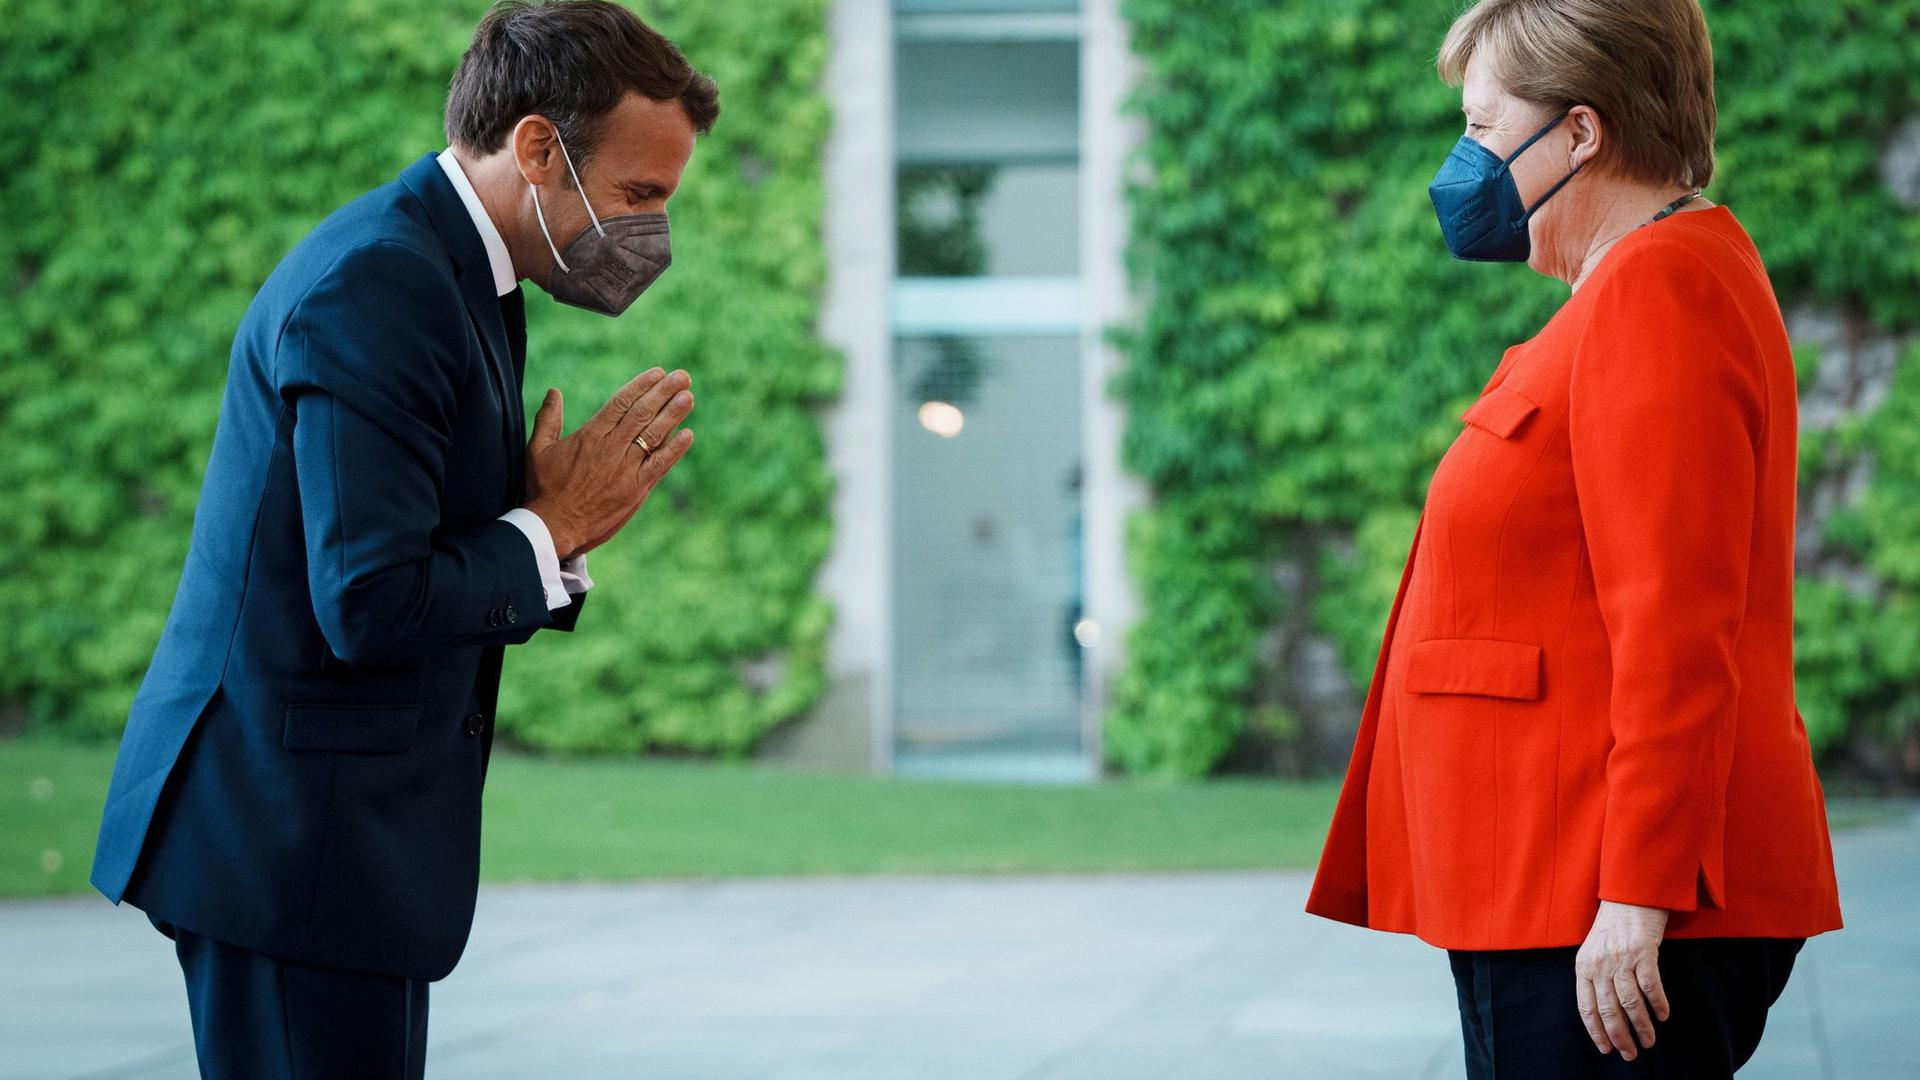 Emmanuel Macron begrüßt Angela Merkel vor dem Bundeskanzleramt.